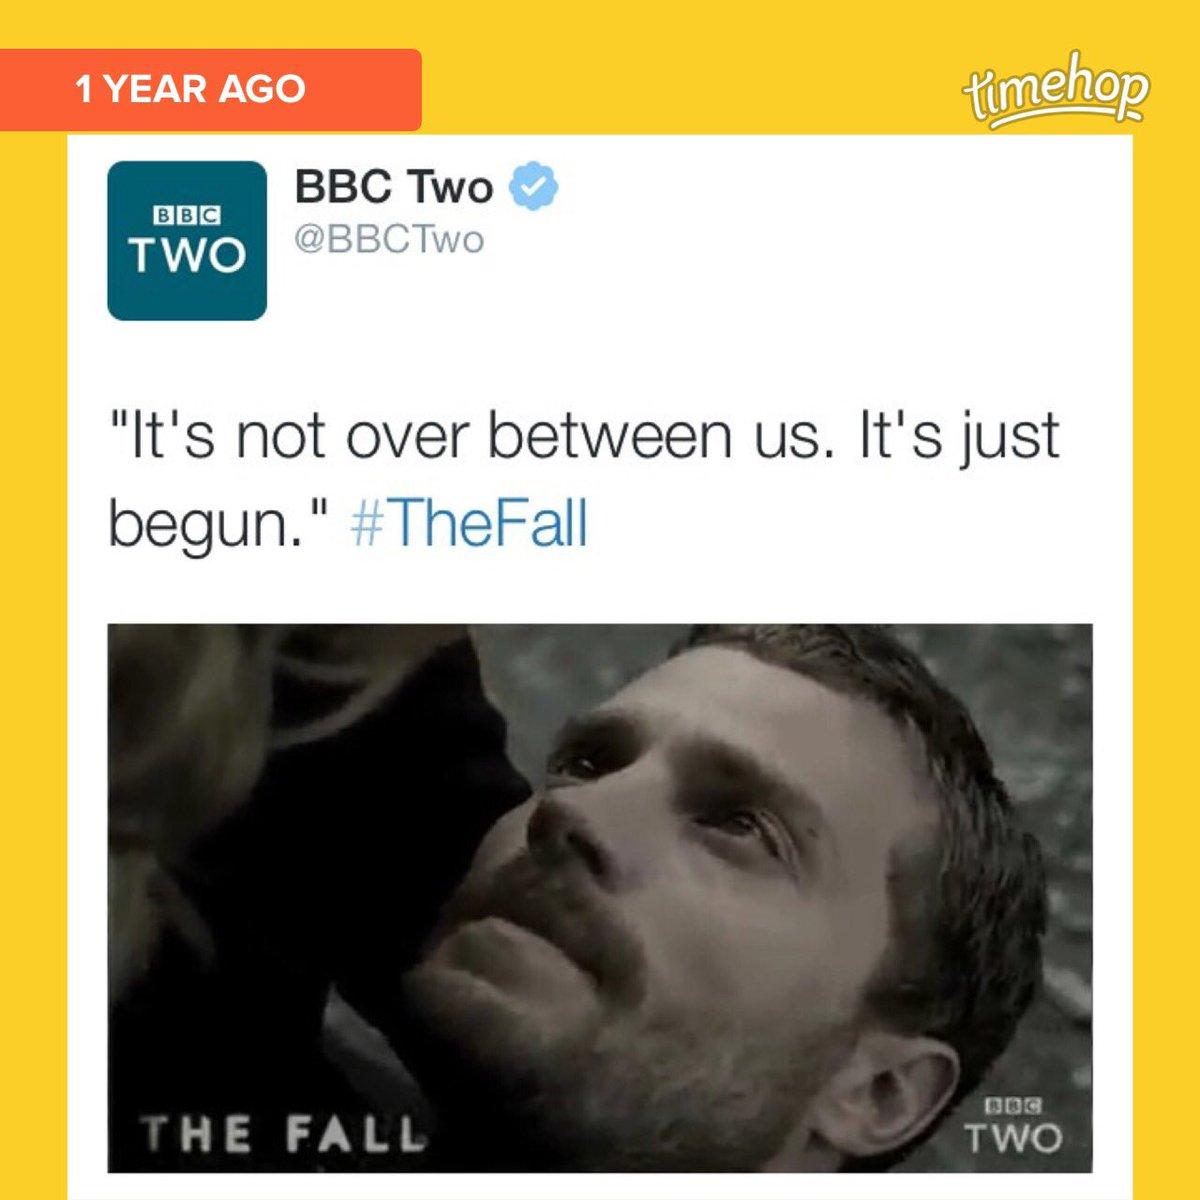 @JamieDornan_org aww, one year ago Season 3 of #TheFall was announced! #jamiedornan https://t.co/XXBLPFz00n